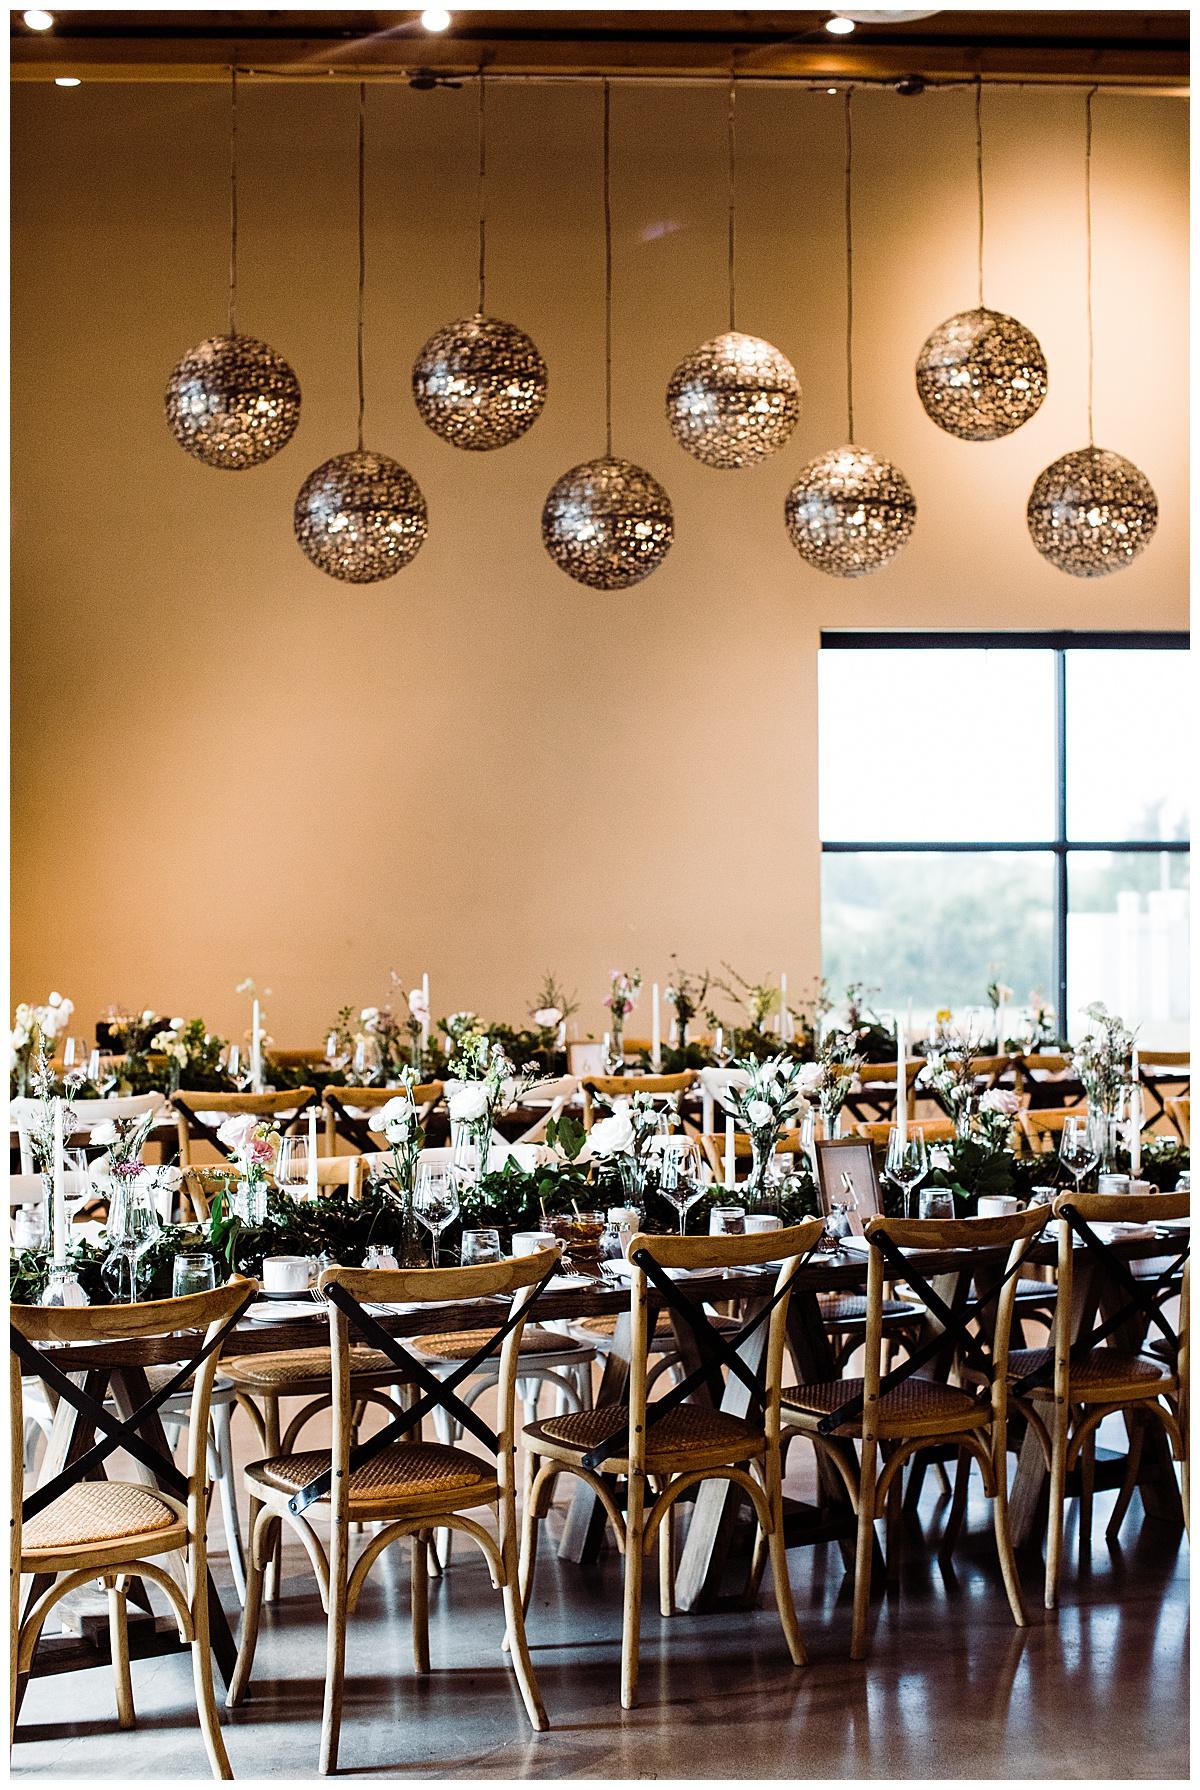 Winery wedding reception| Adamo Estate Winery Wedding reception| Toronto photographer| 3photography